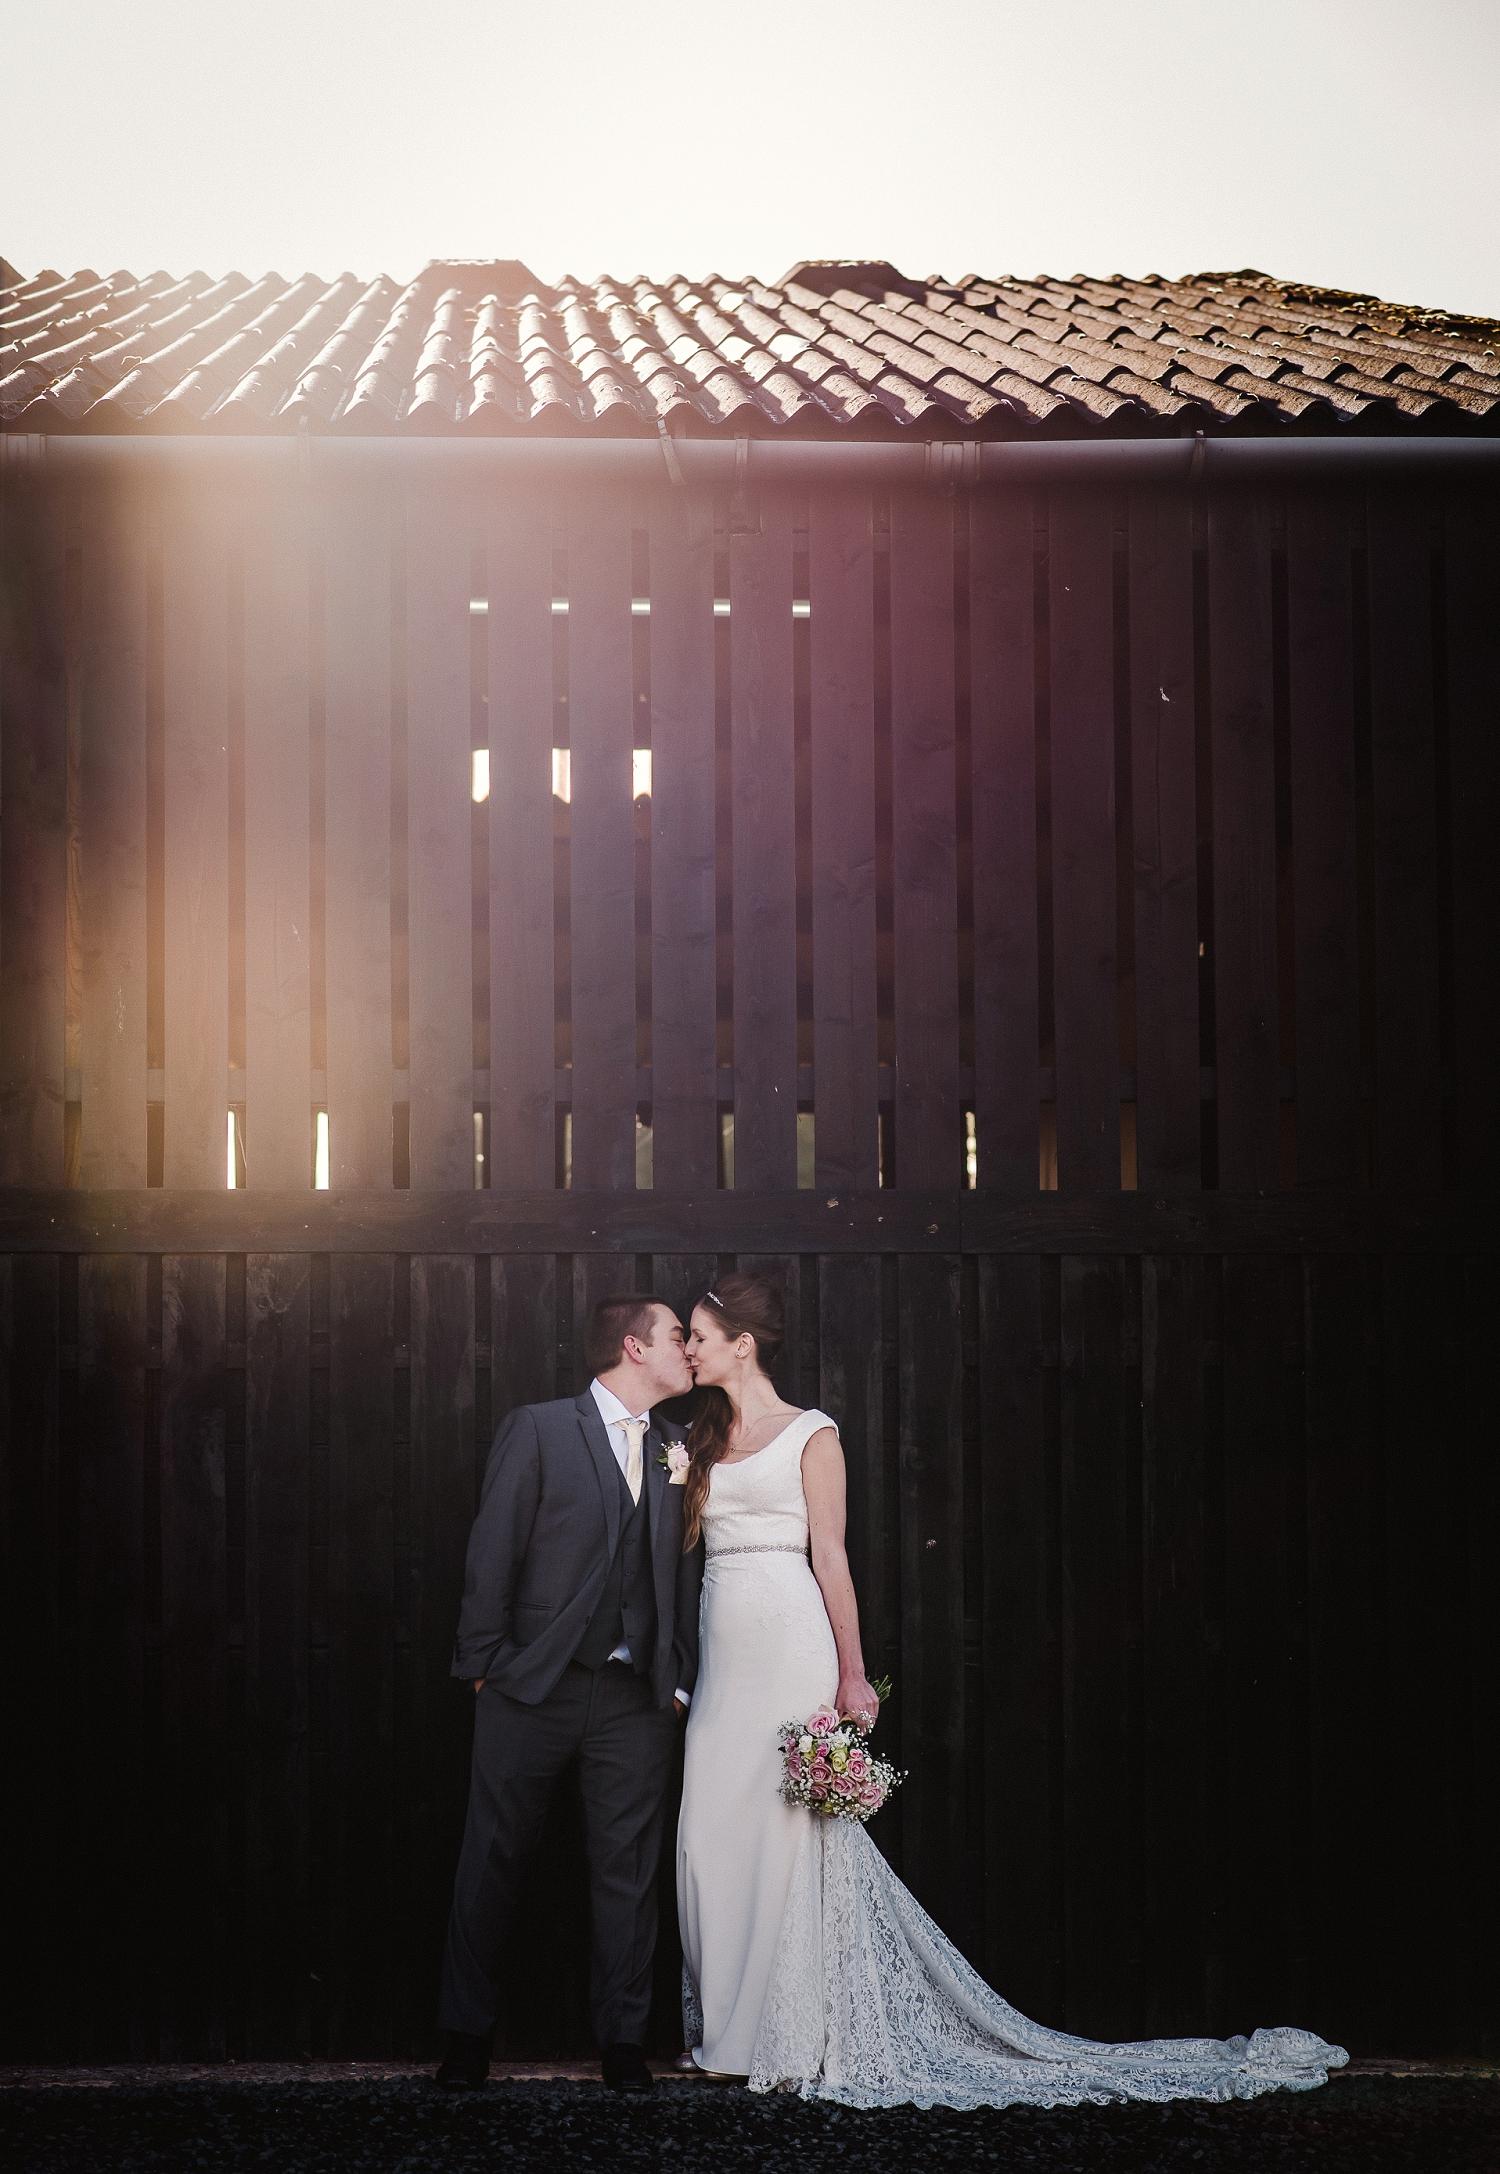 Lisa_Shaun_curradine_wedding_0065.jpg